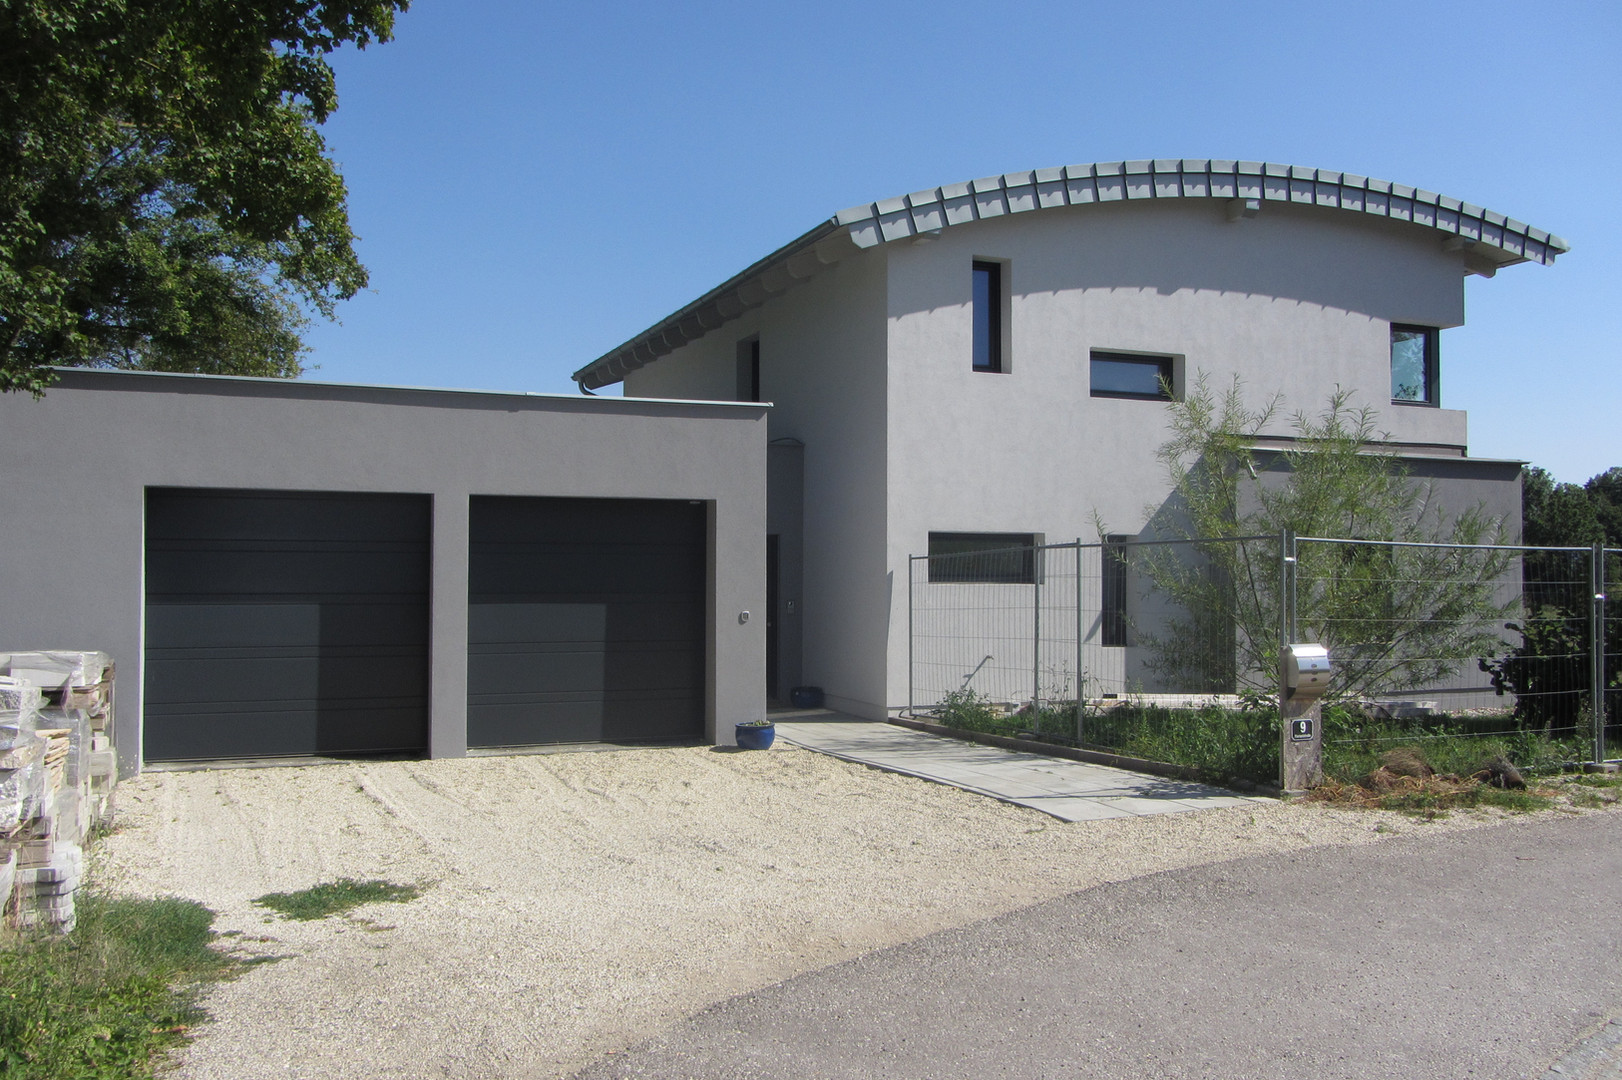 Passivhaus Olgersdorf 02.JPG